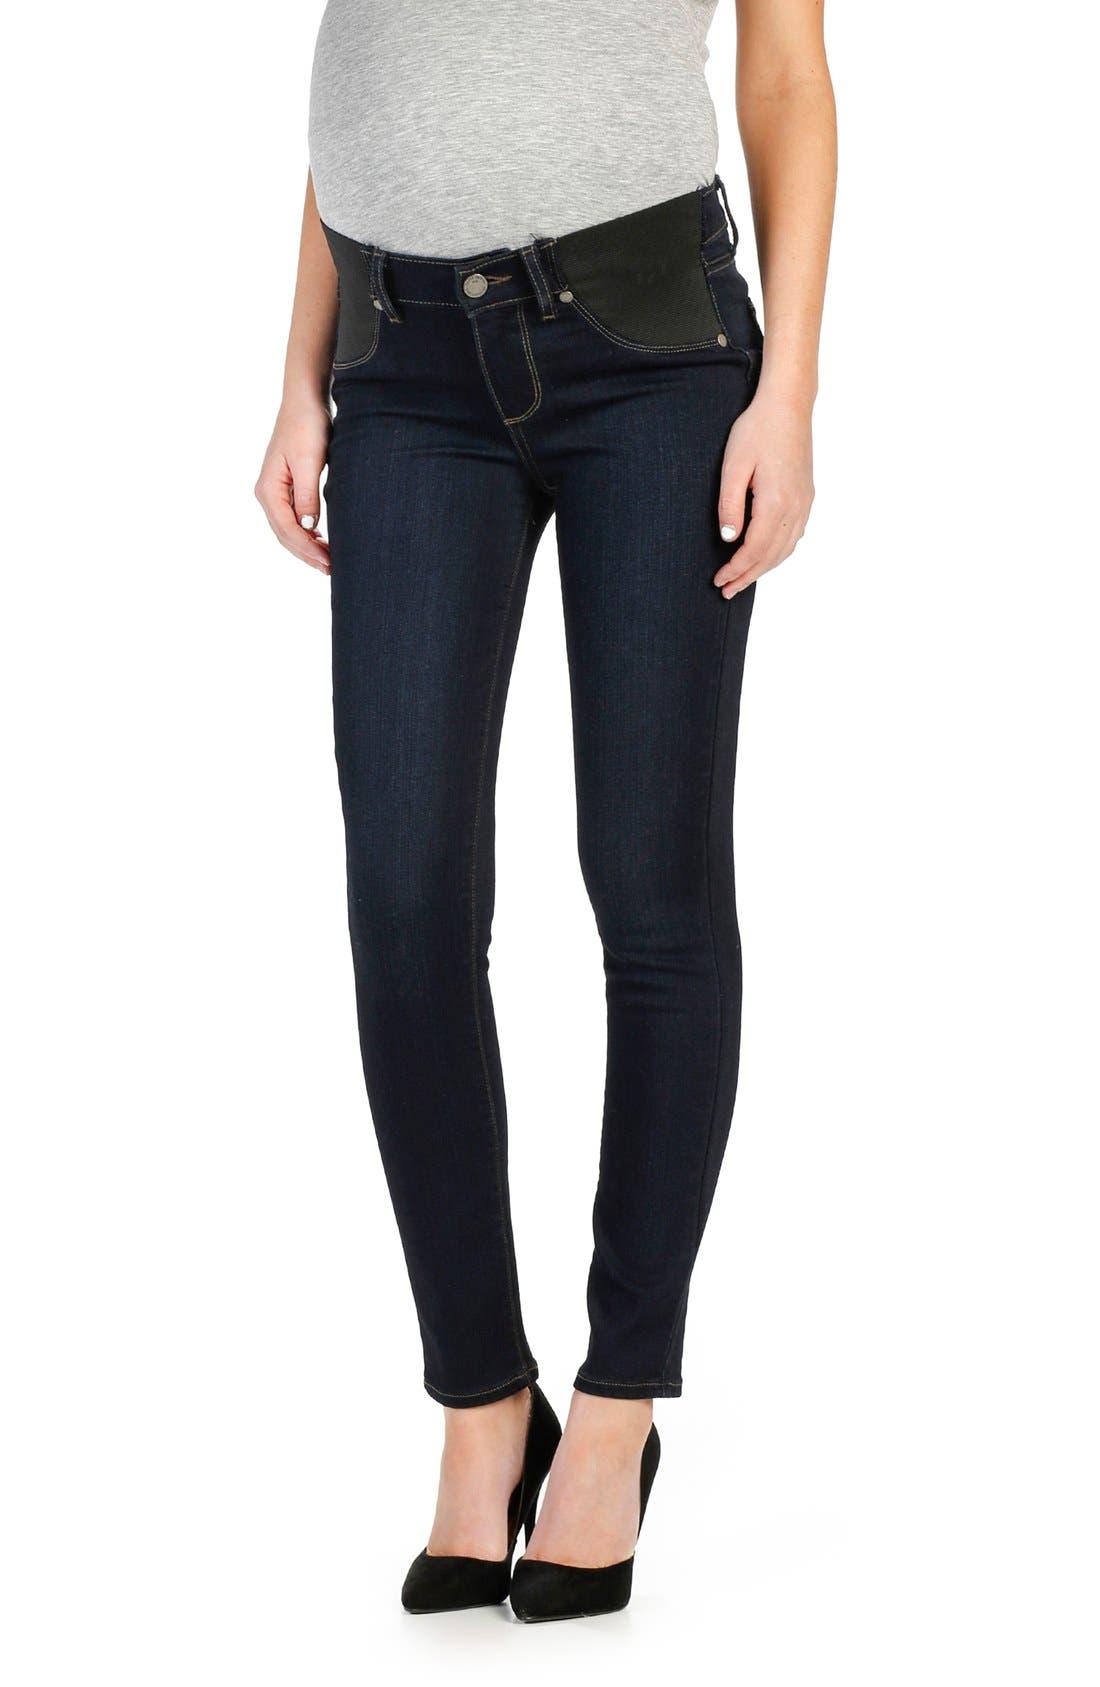 Transcend - Verdugo Ankle Skinny Maternity Jeans,                         Main,                         color, MONA